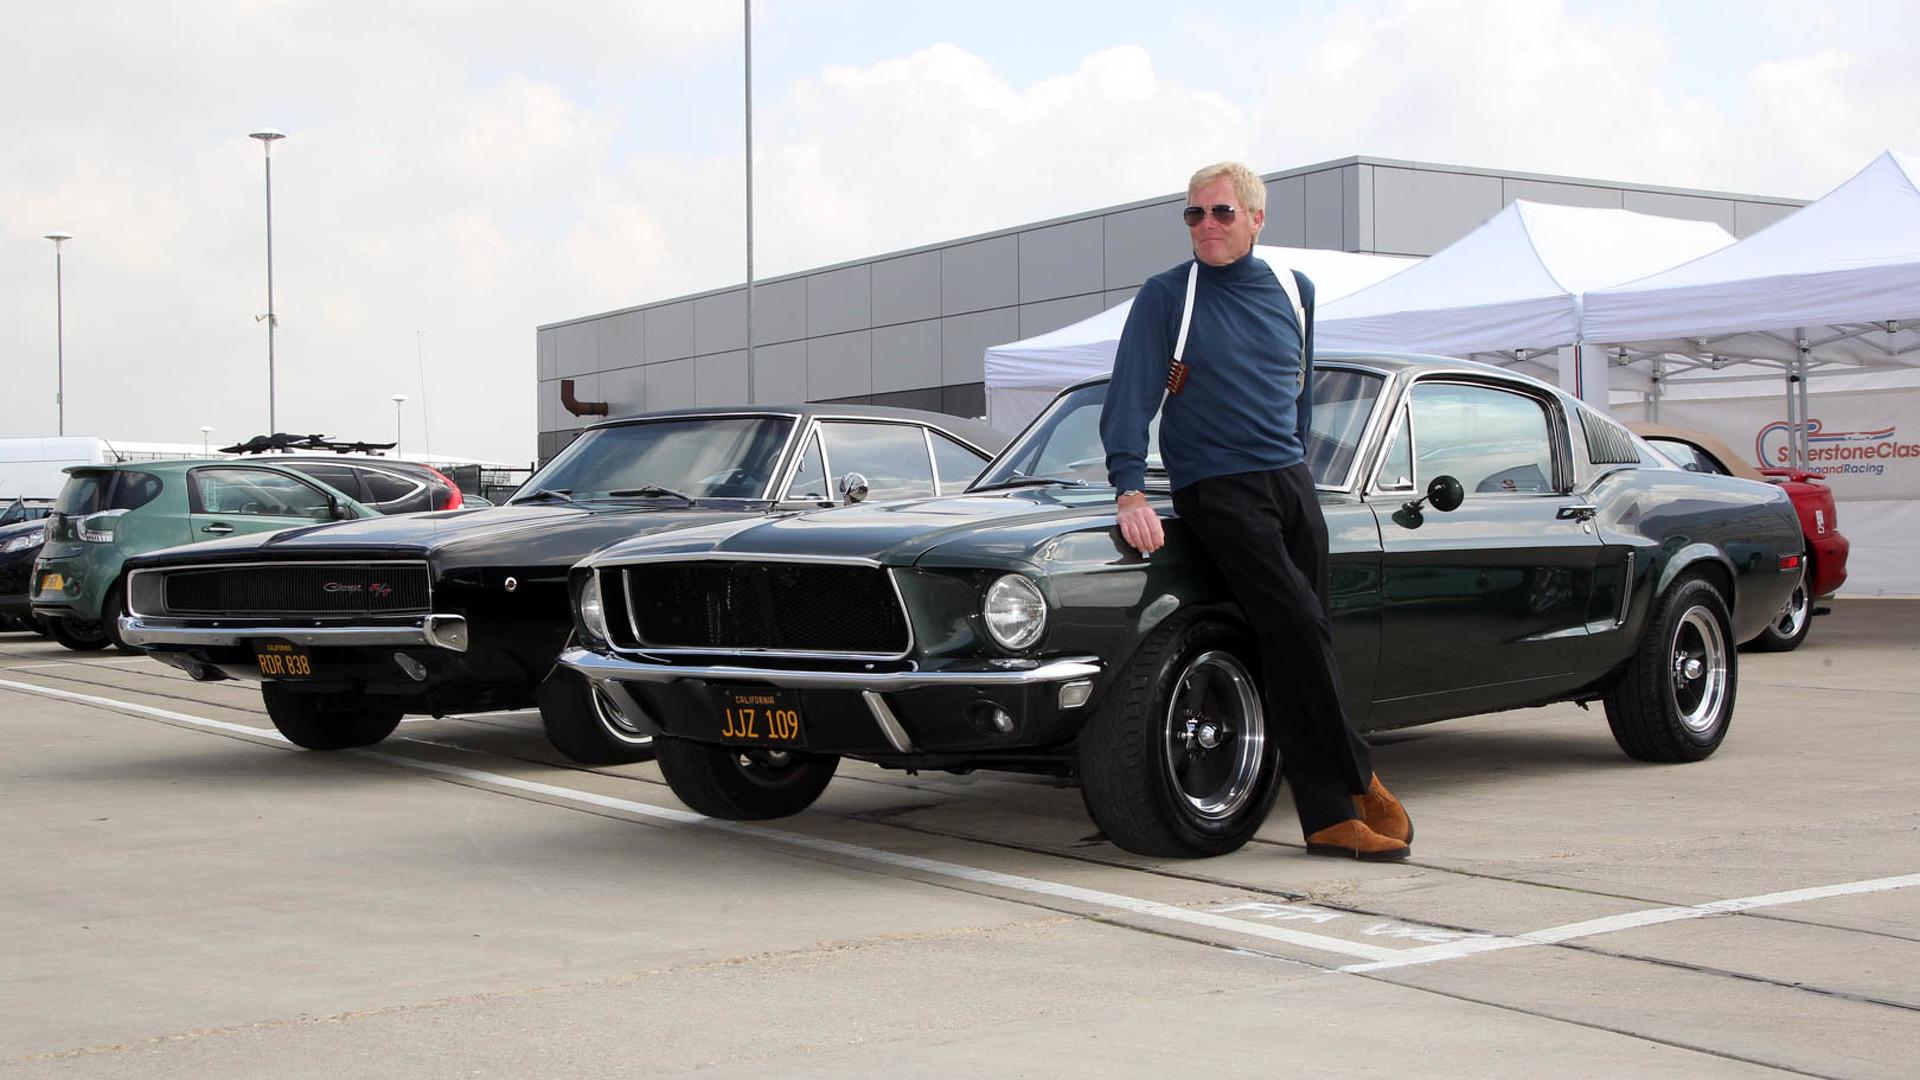 Steve Mcqueen Wallpaper Hd Iconic Bullitt Mustang Found In Californian Desert